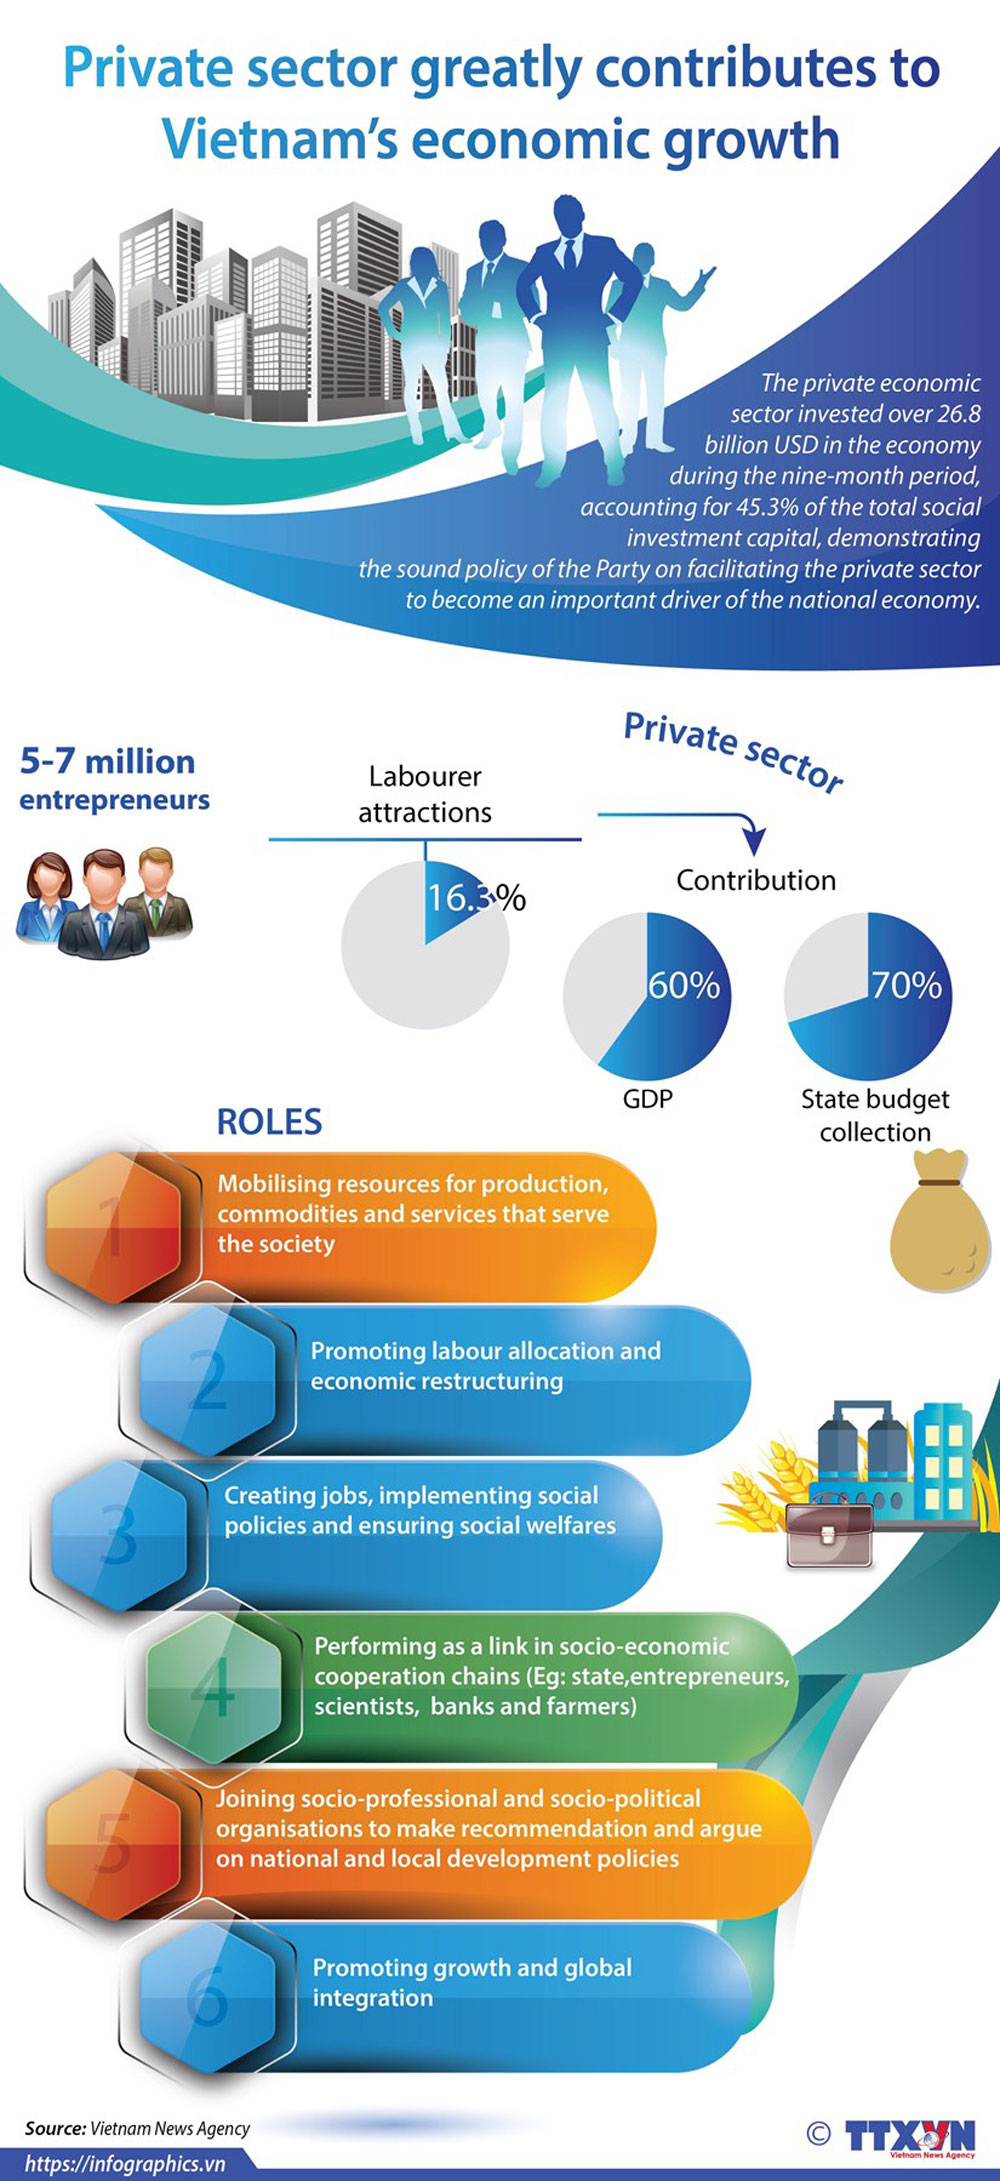 Private sector, Vietnam's economic growth, social investment capital, economic development